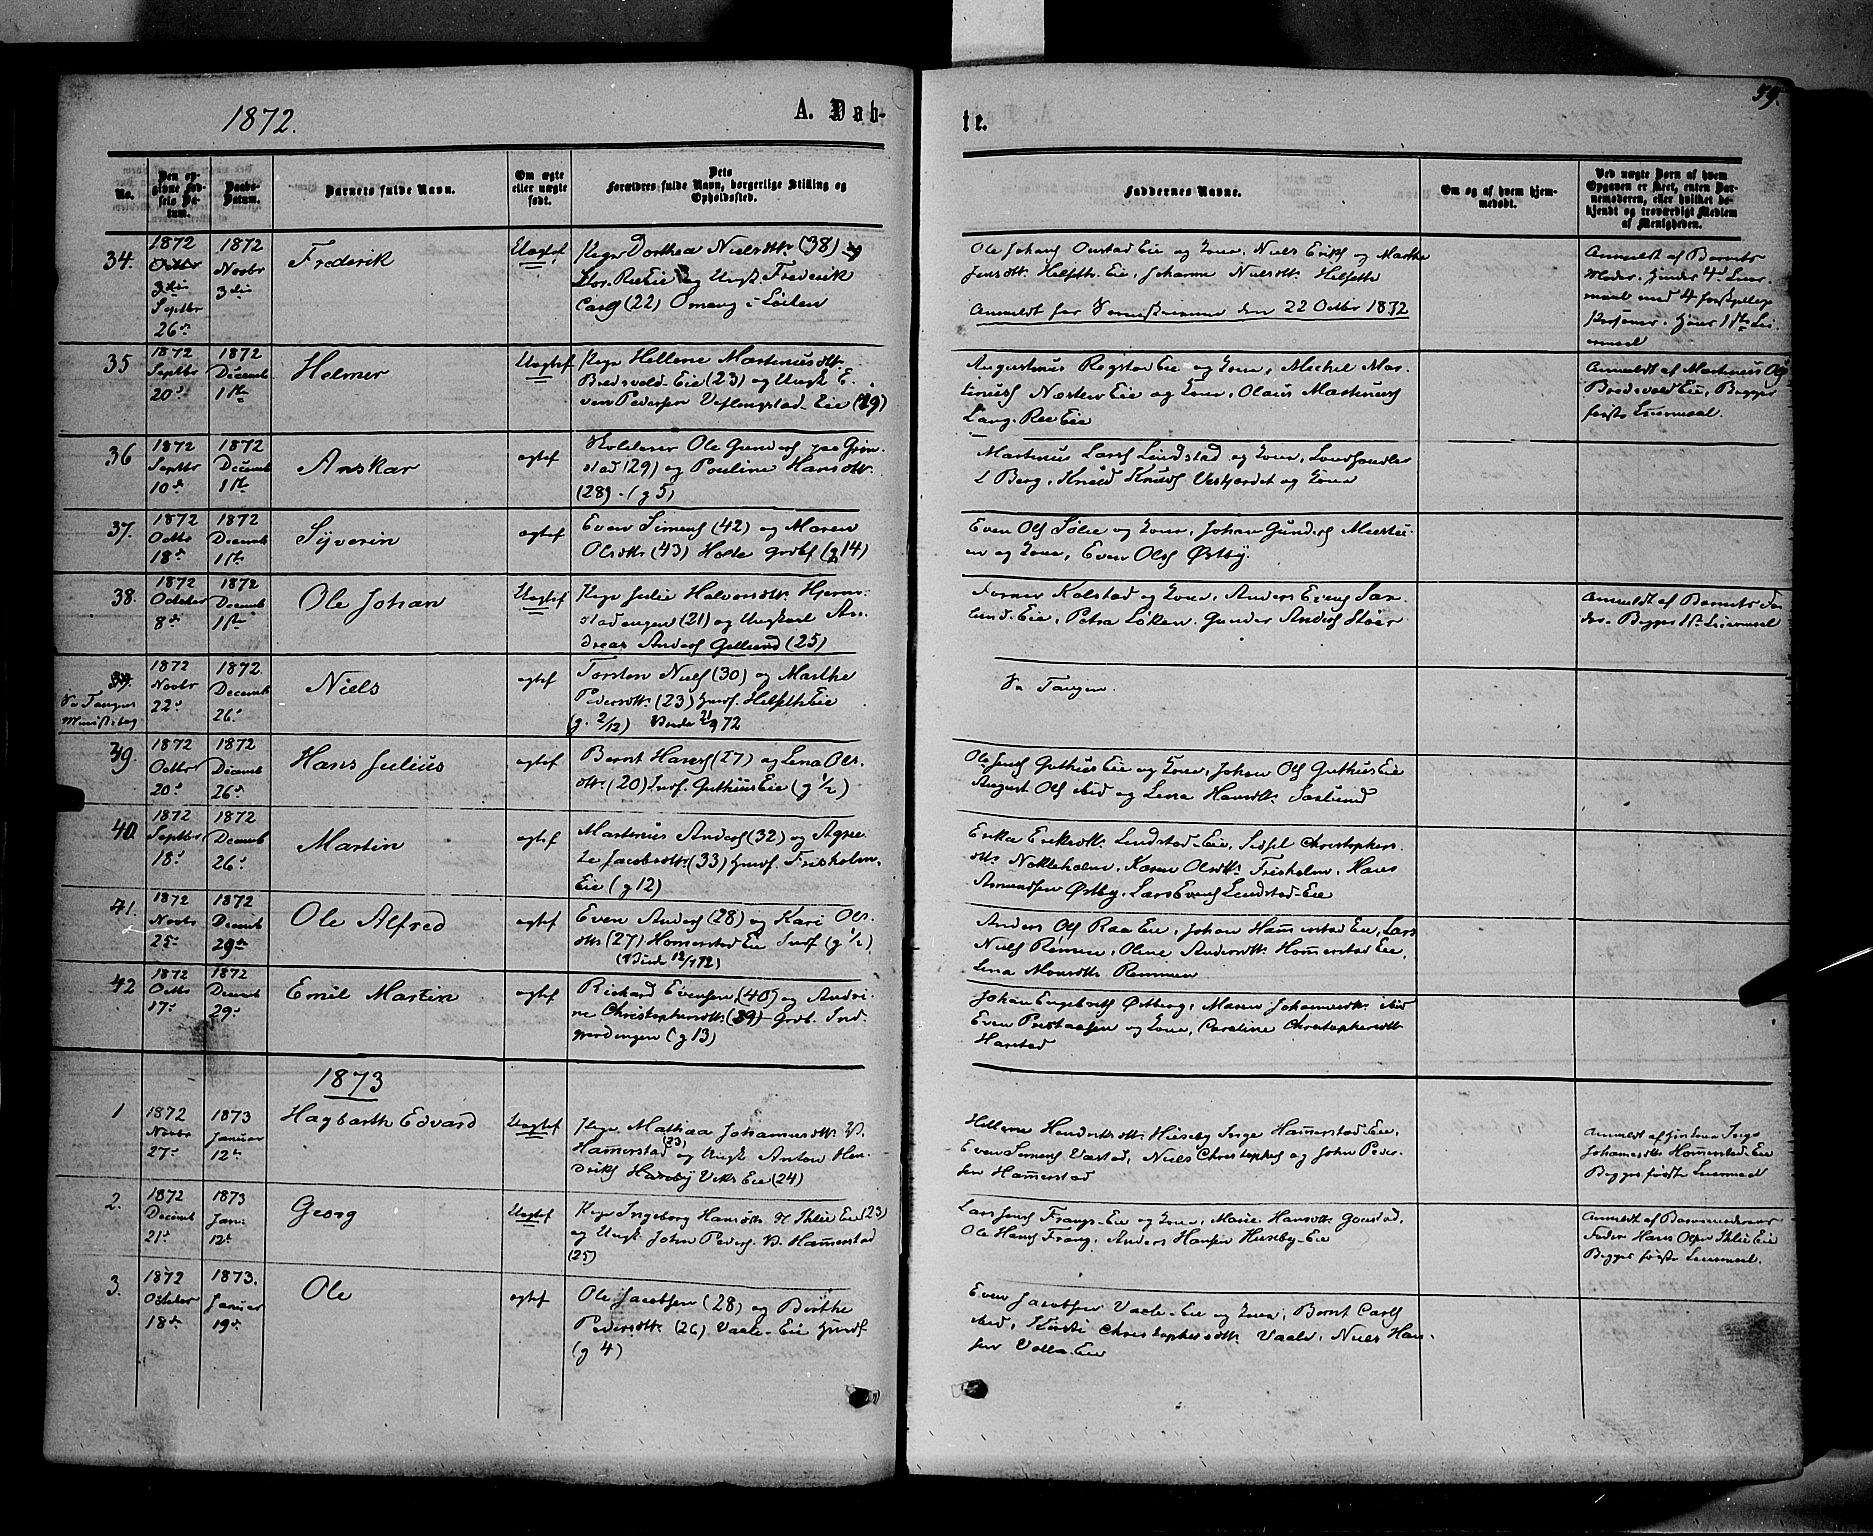 SAH, Stange prestekontor, K/L0013: Ministerialbok nr. 13, 1862-1879, s. 59